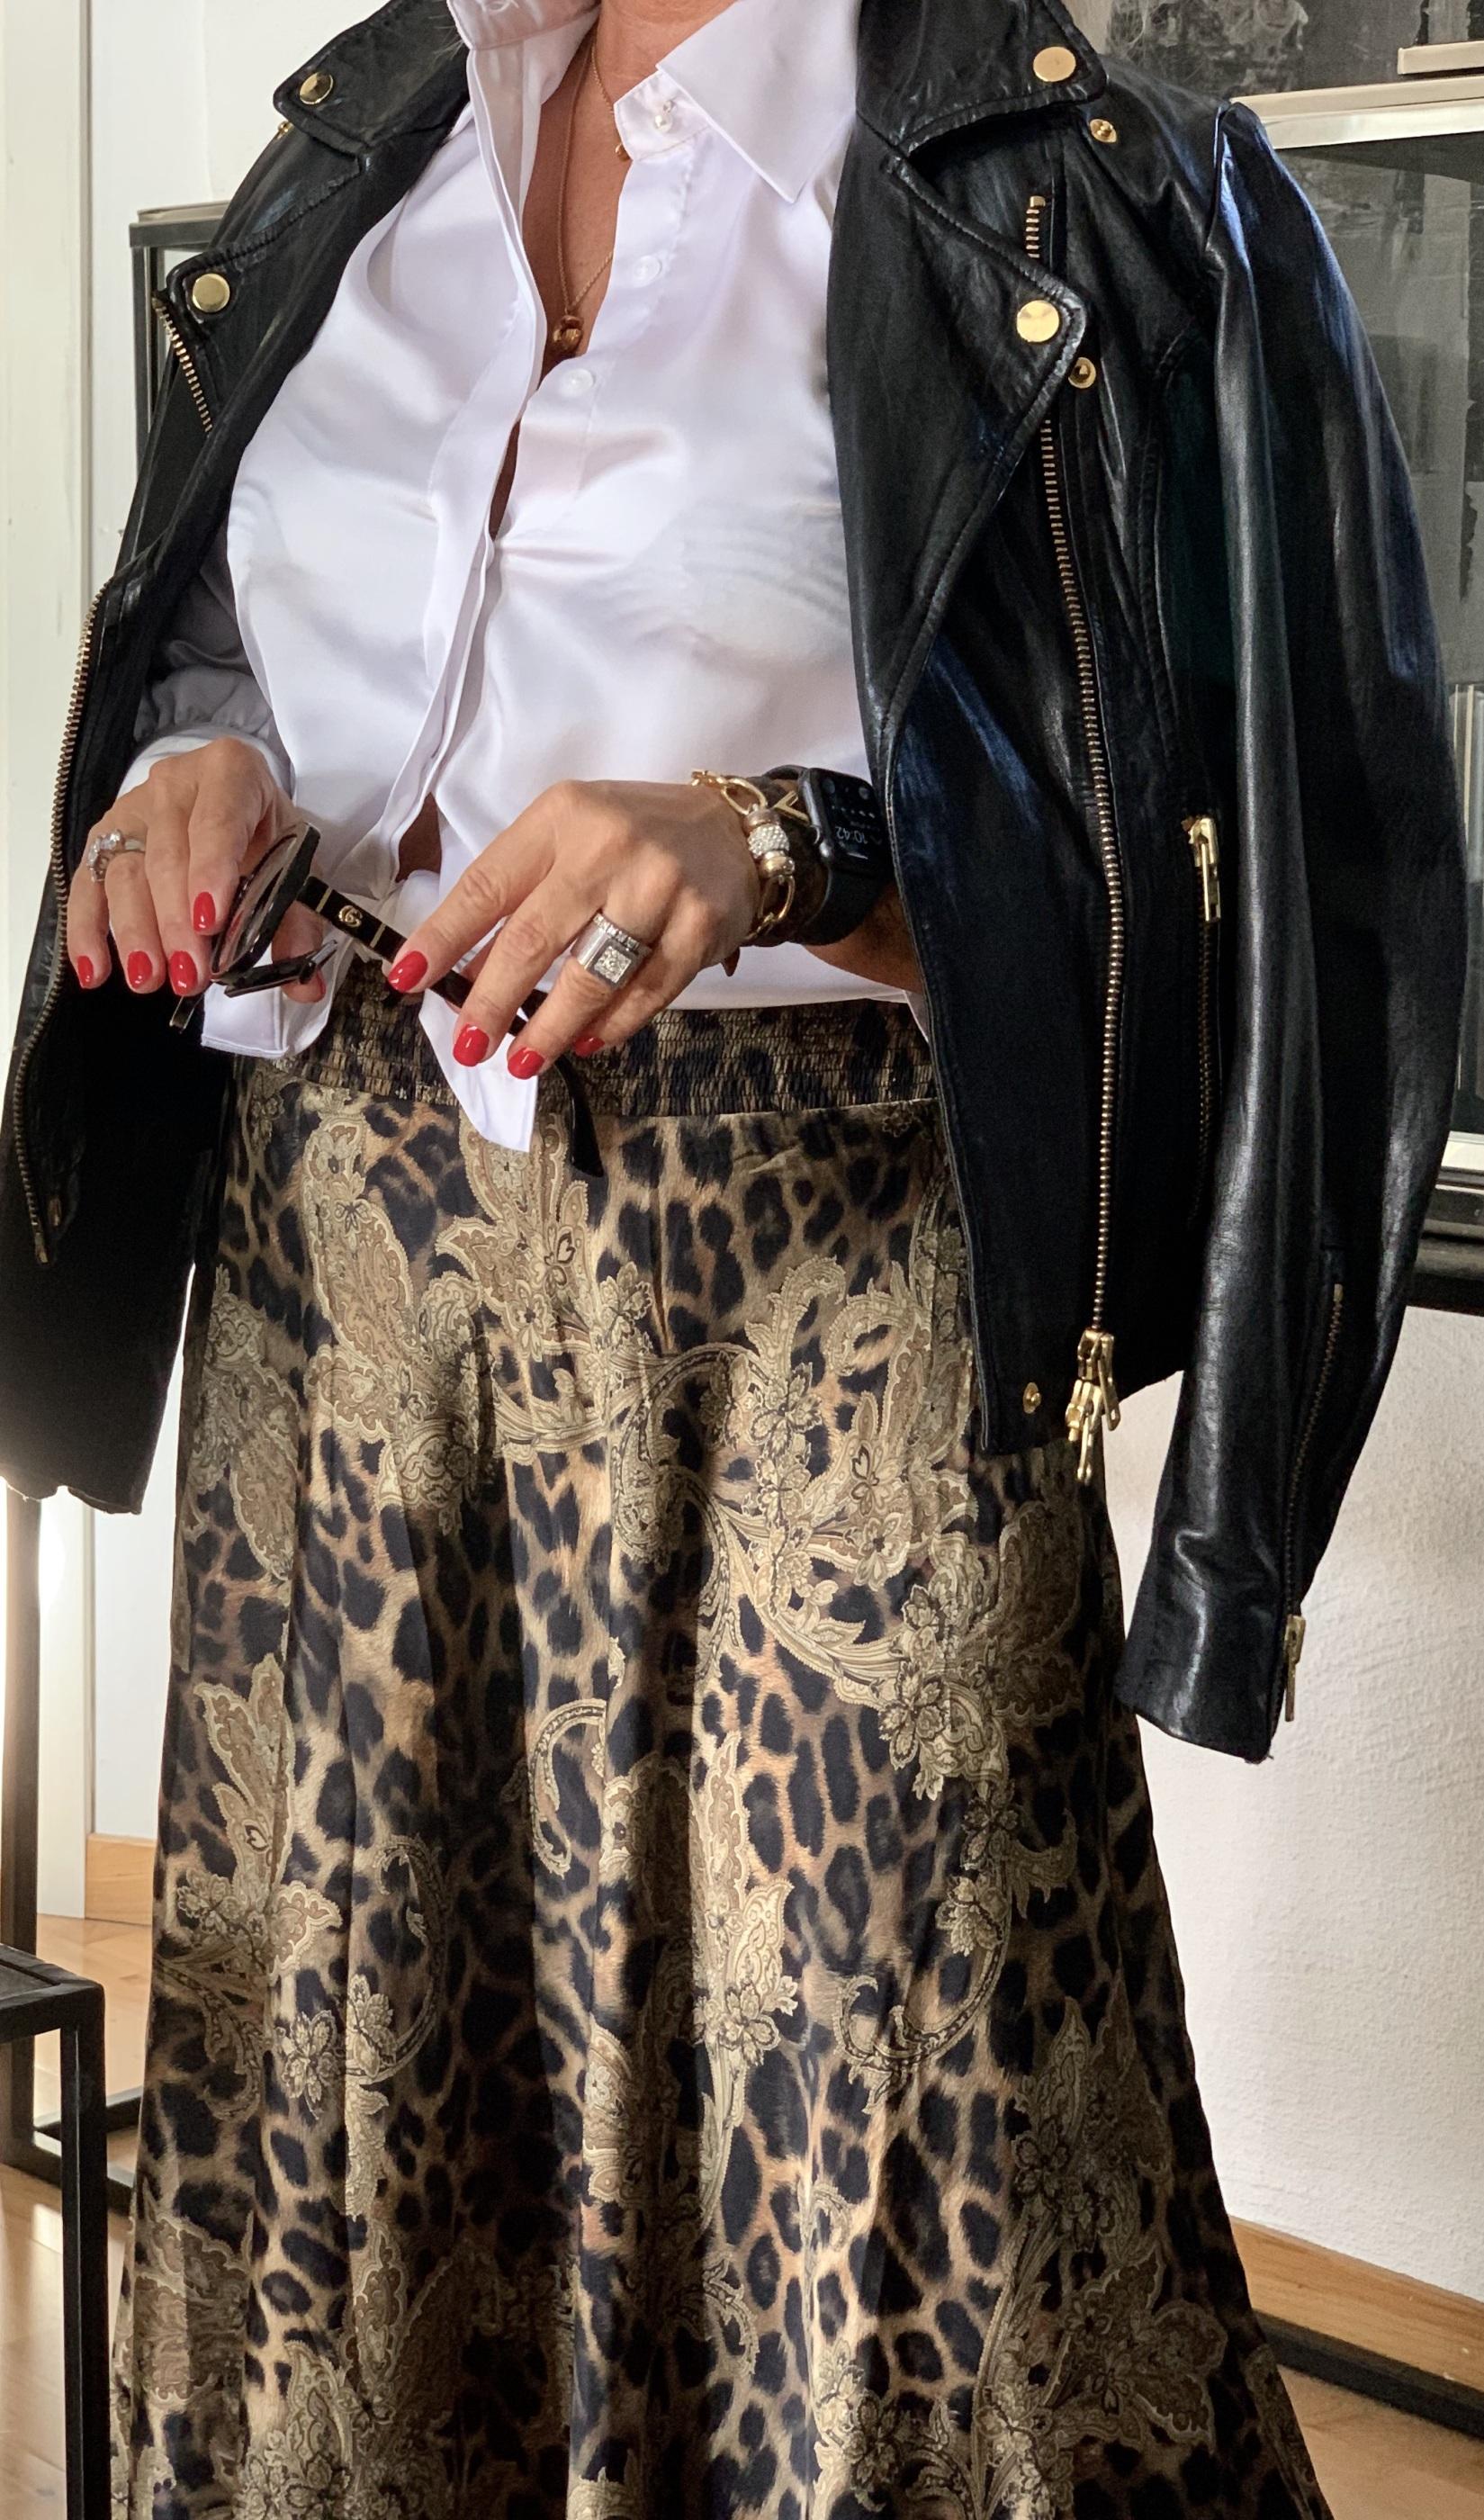 KARMAMIA Savannah Skirt - Leo Paisley IMAGE BY ME